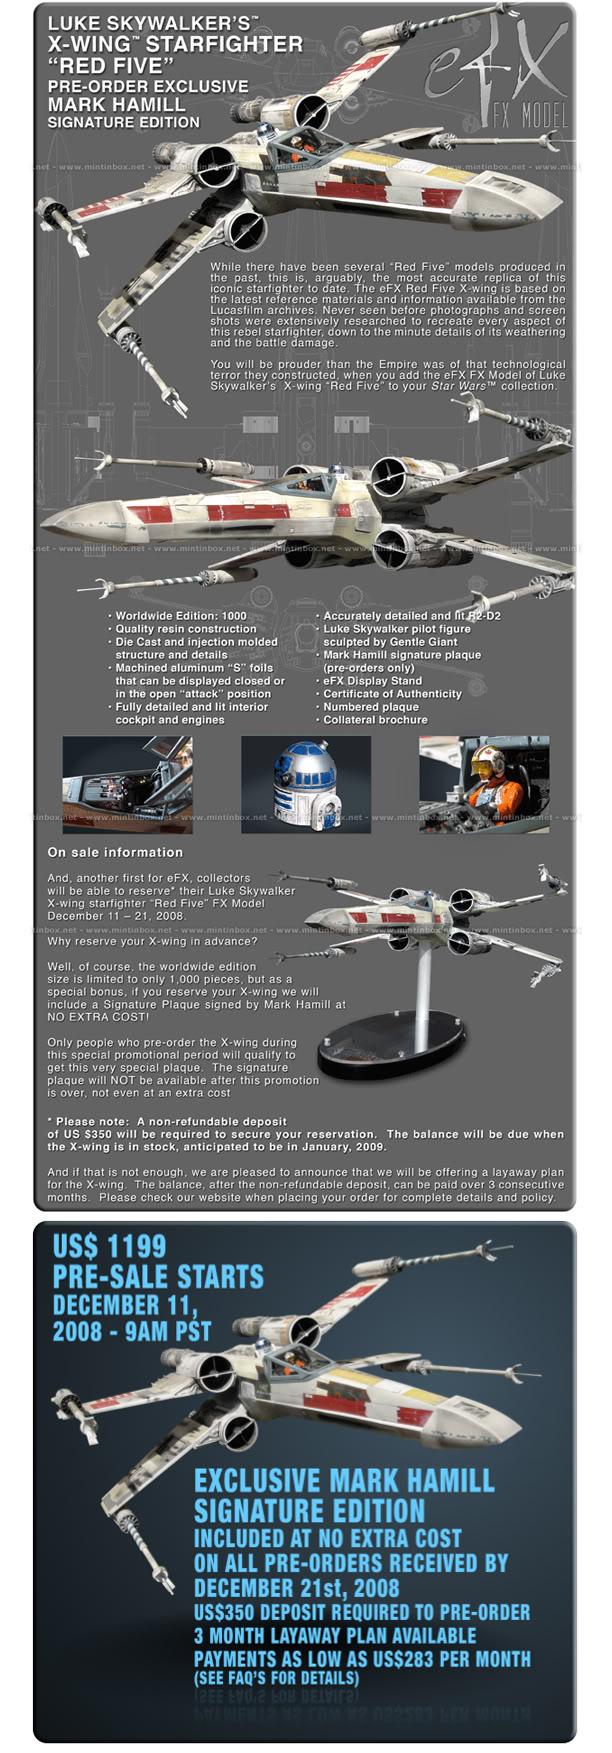 Efx -  luke skywalker red 5 X-wing - Page 2 Efx_xw10